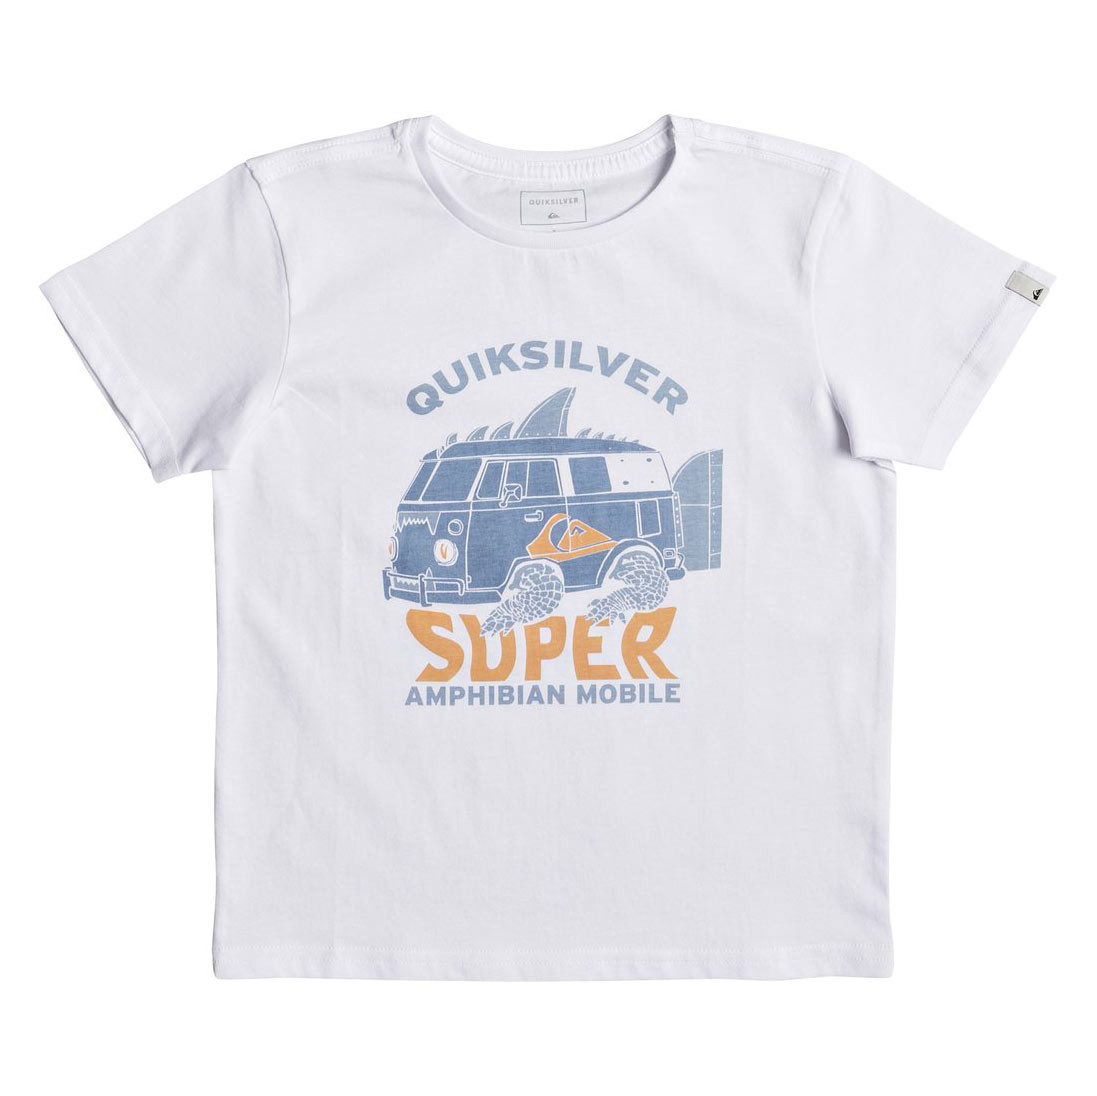 Tričko Quiksilver Boys Classic Ss Amphibian white